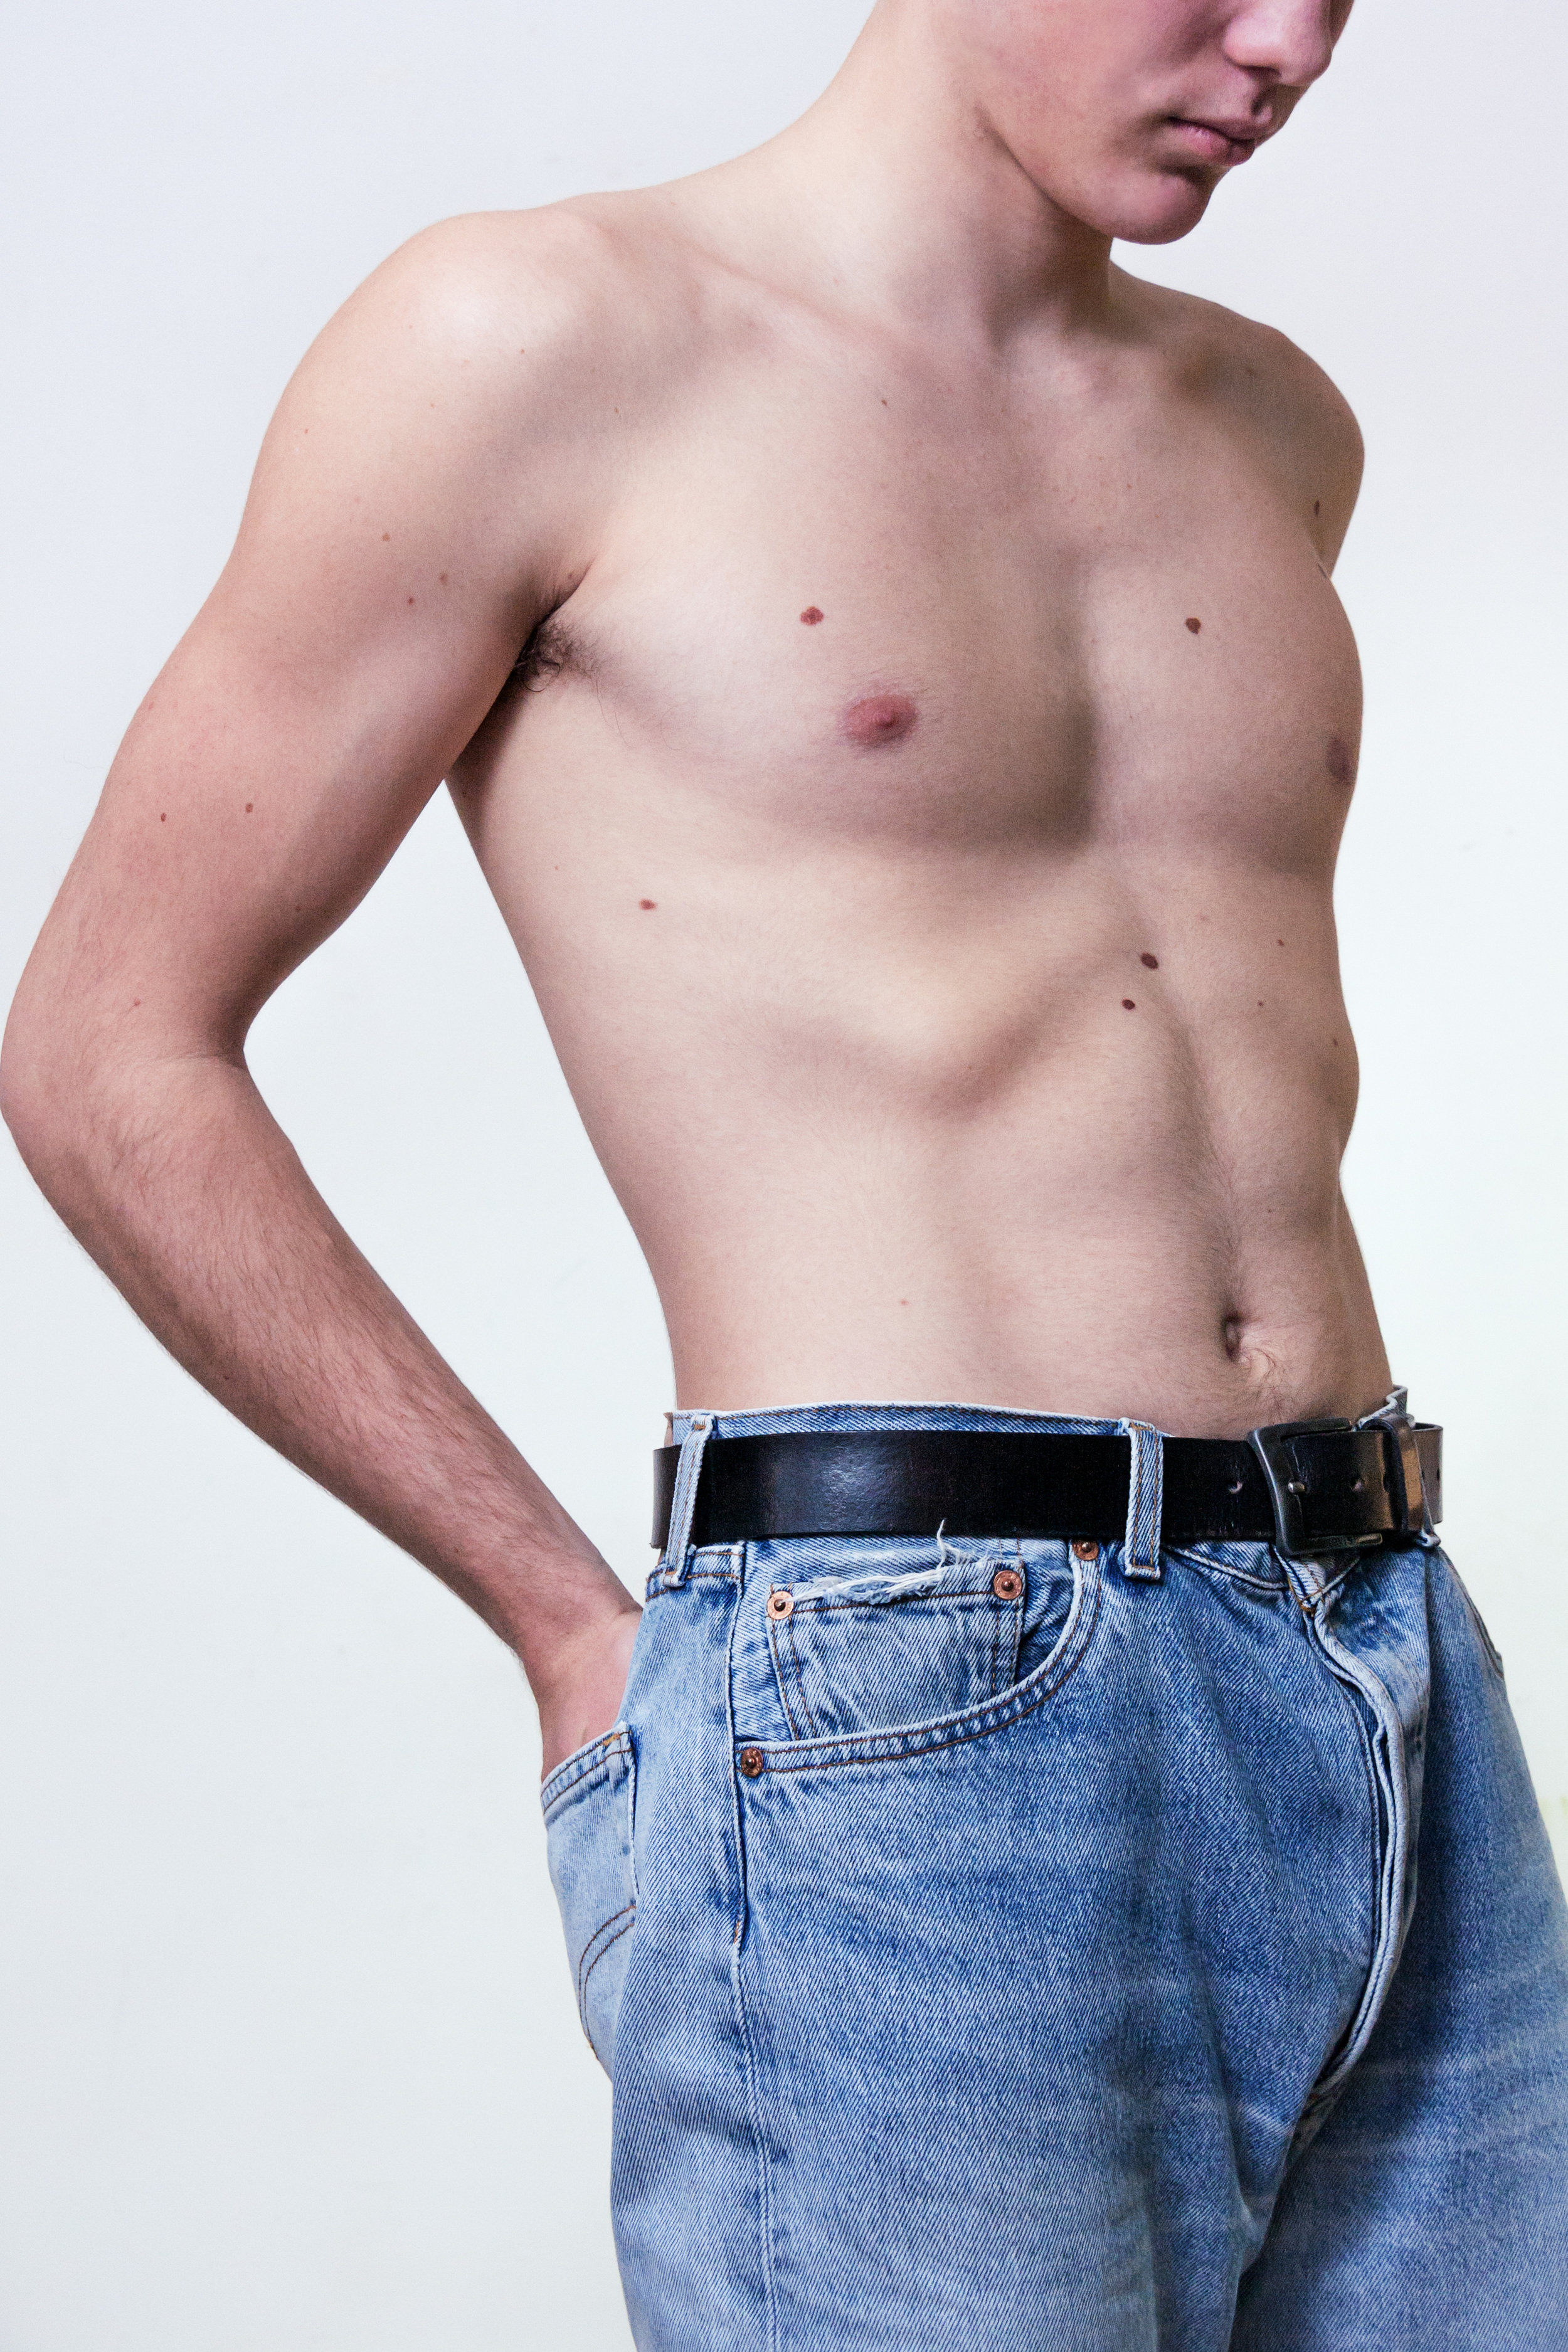 Blue jeans boy 6.jpg